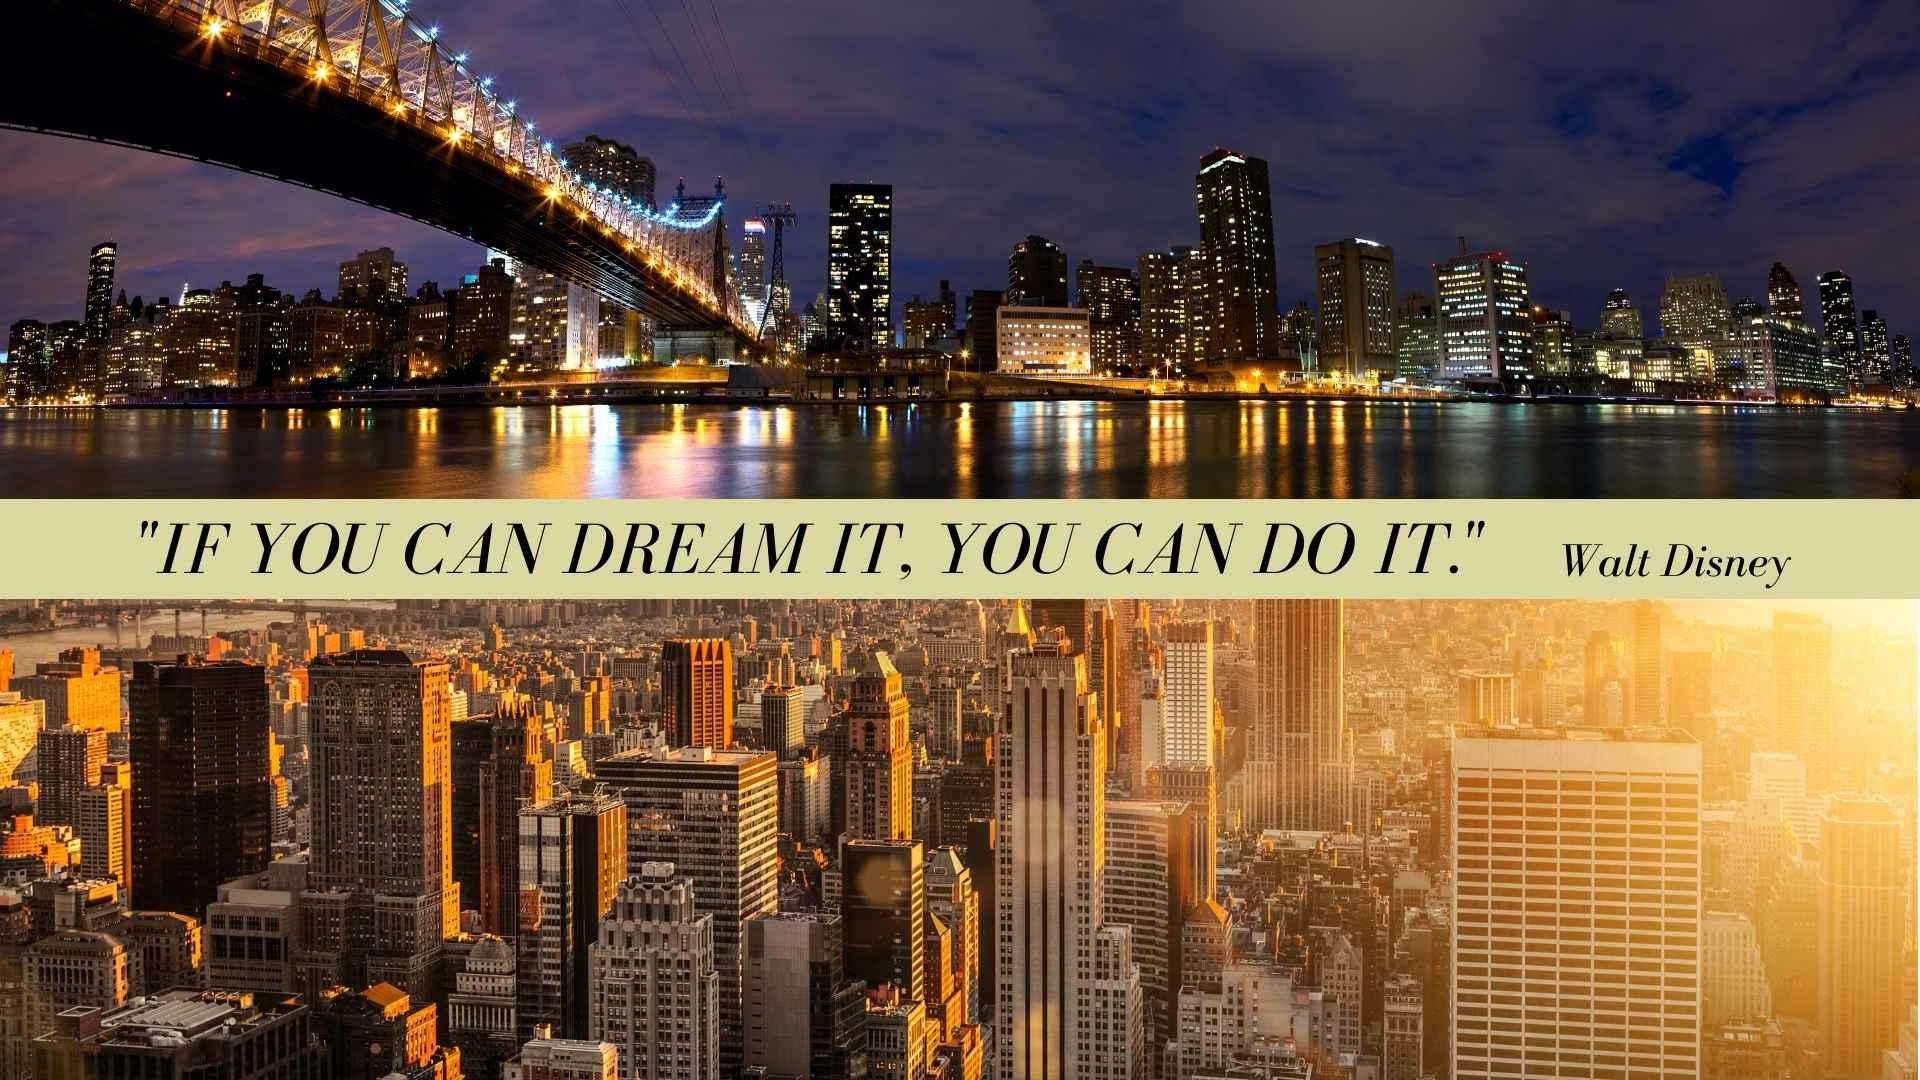 Skyline di New York con frase di Walt Disney - If you can dream it you can do it